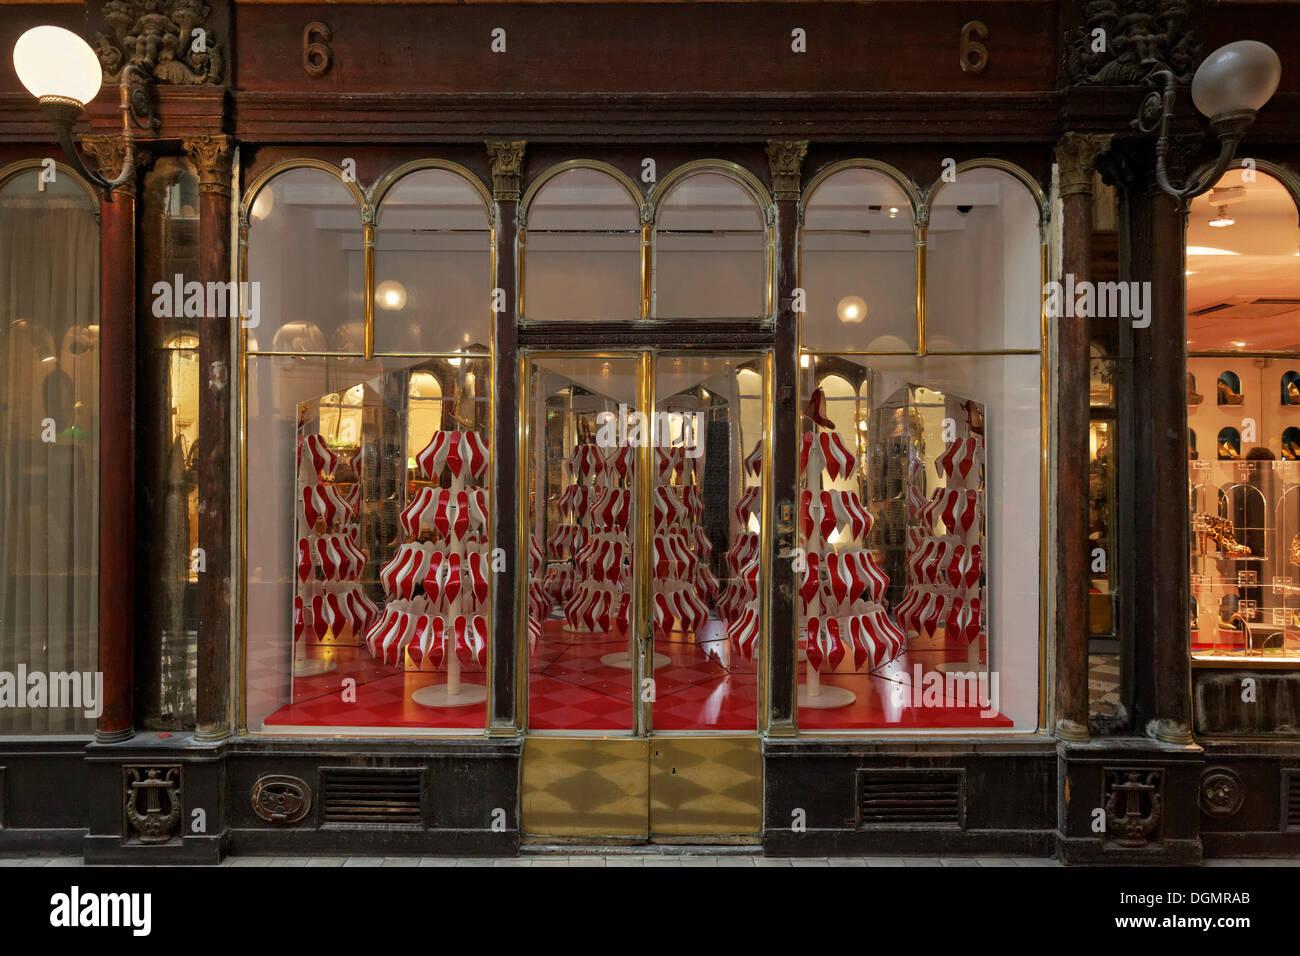 louboutin boutique monaco,louboutin escarpins femme,christian louboutin catac...